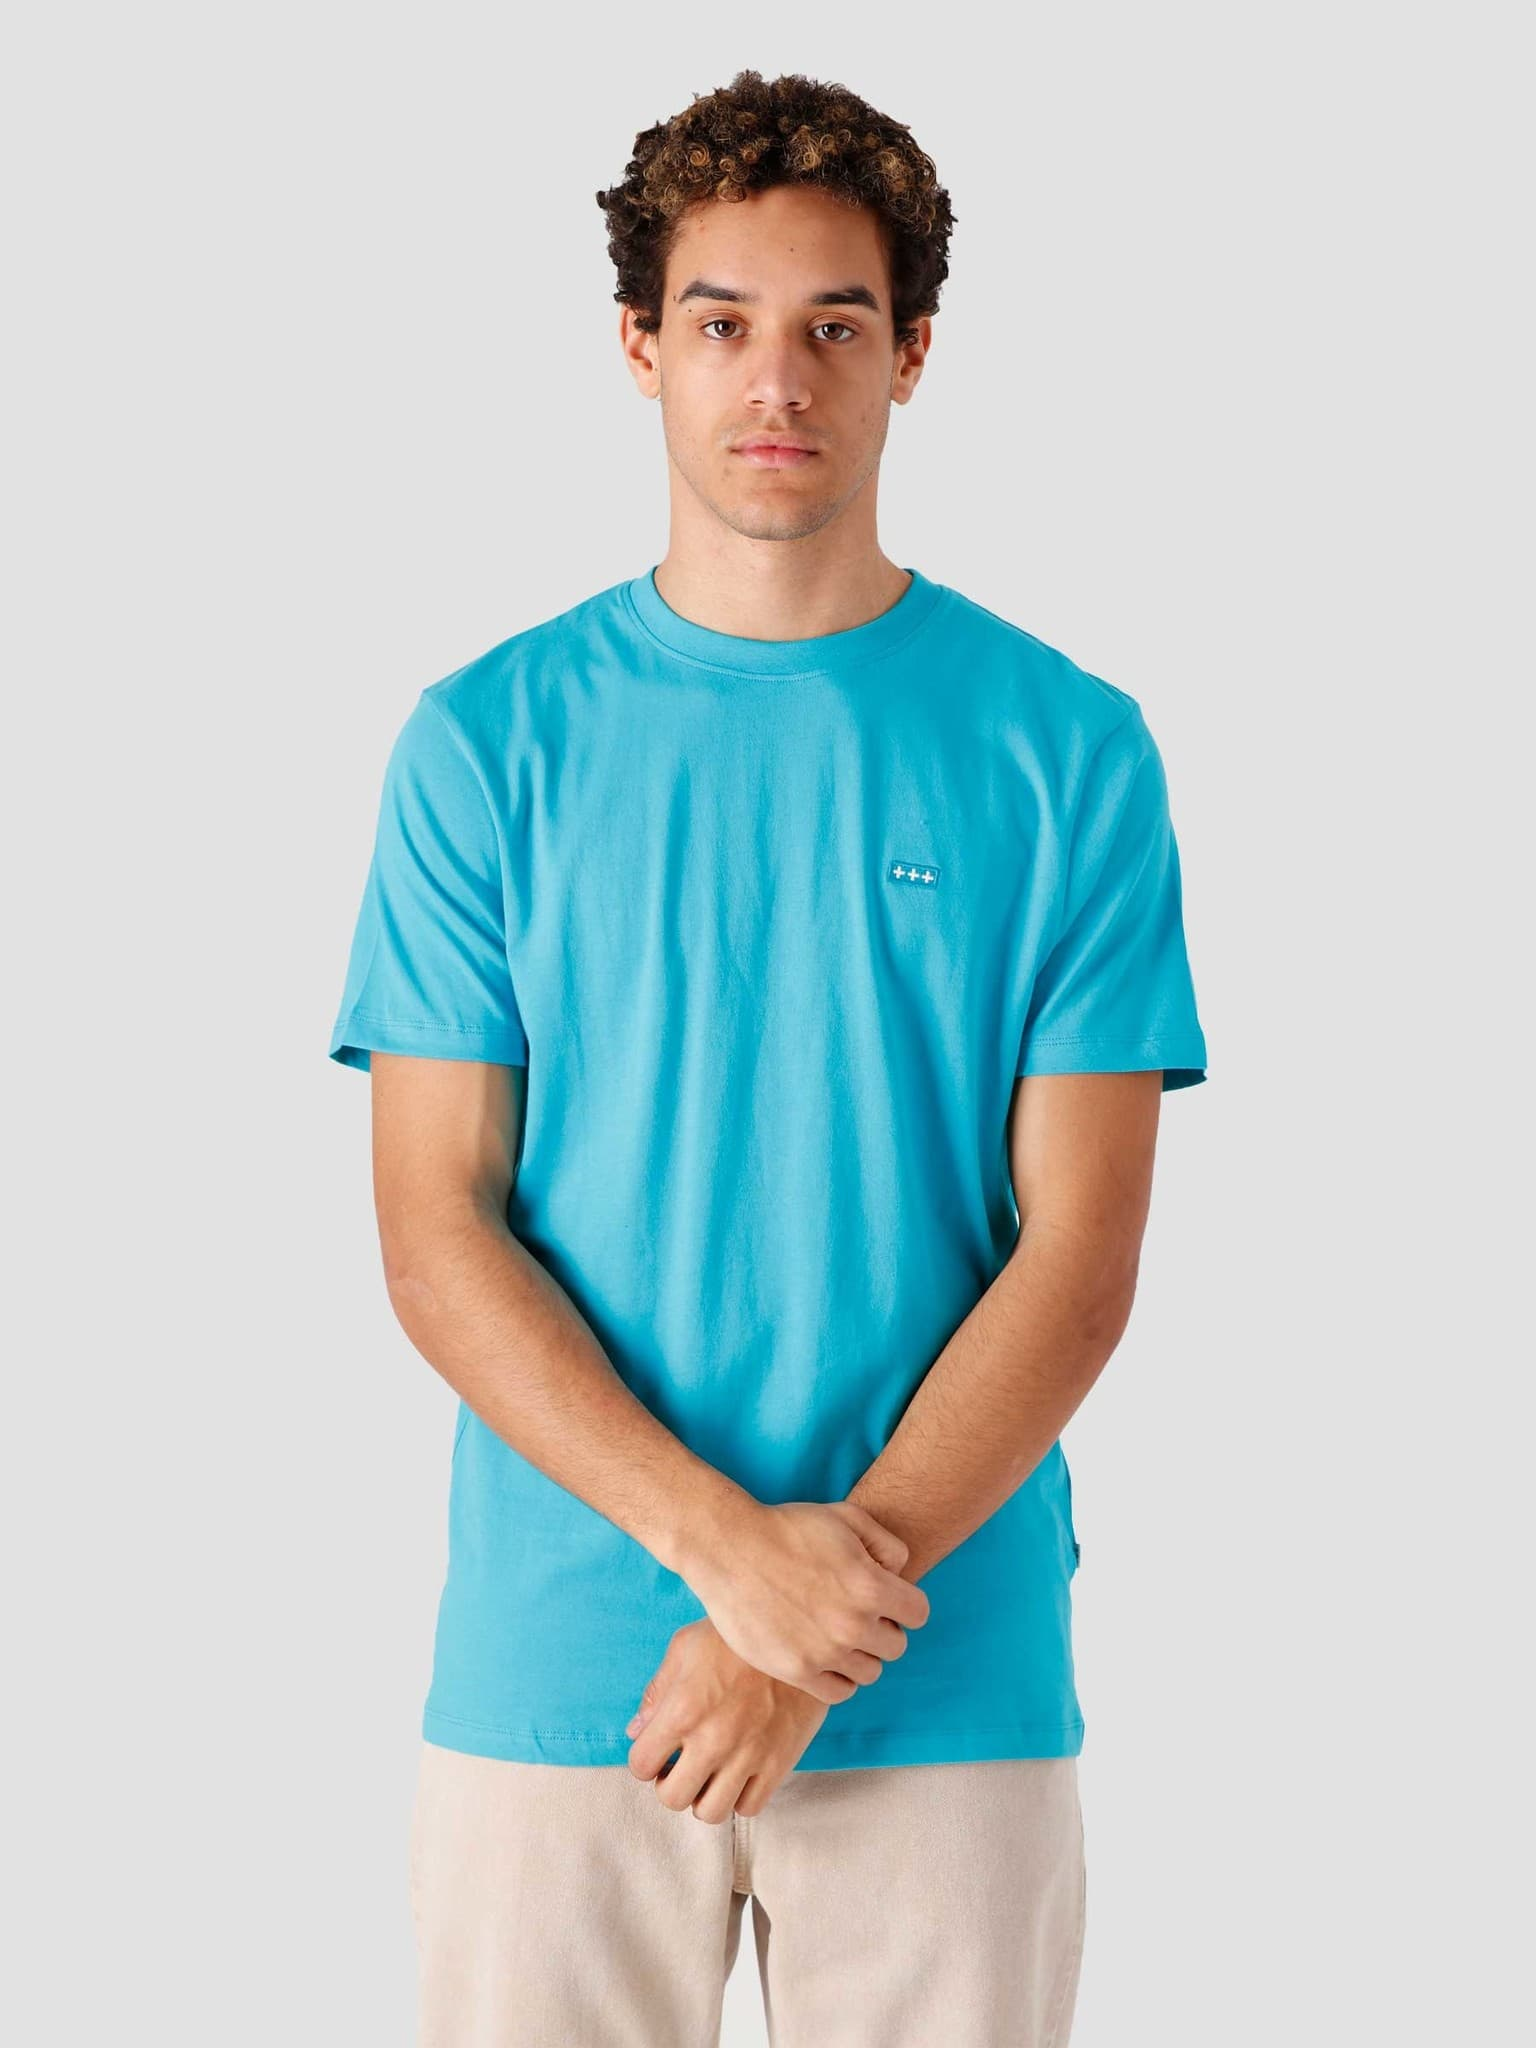 QB03 Patch Logo T-shirt Surf Blue